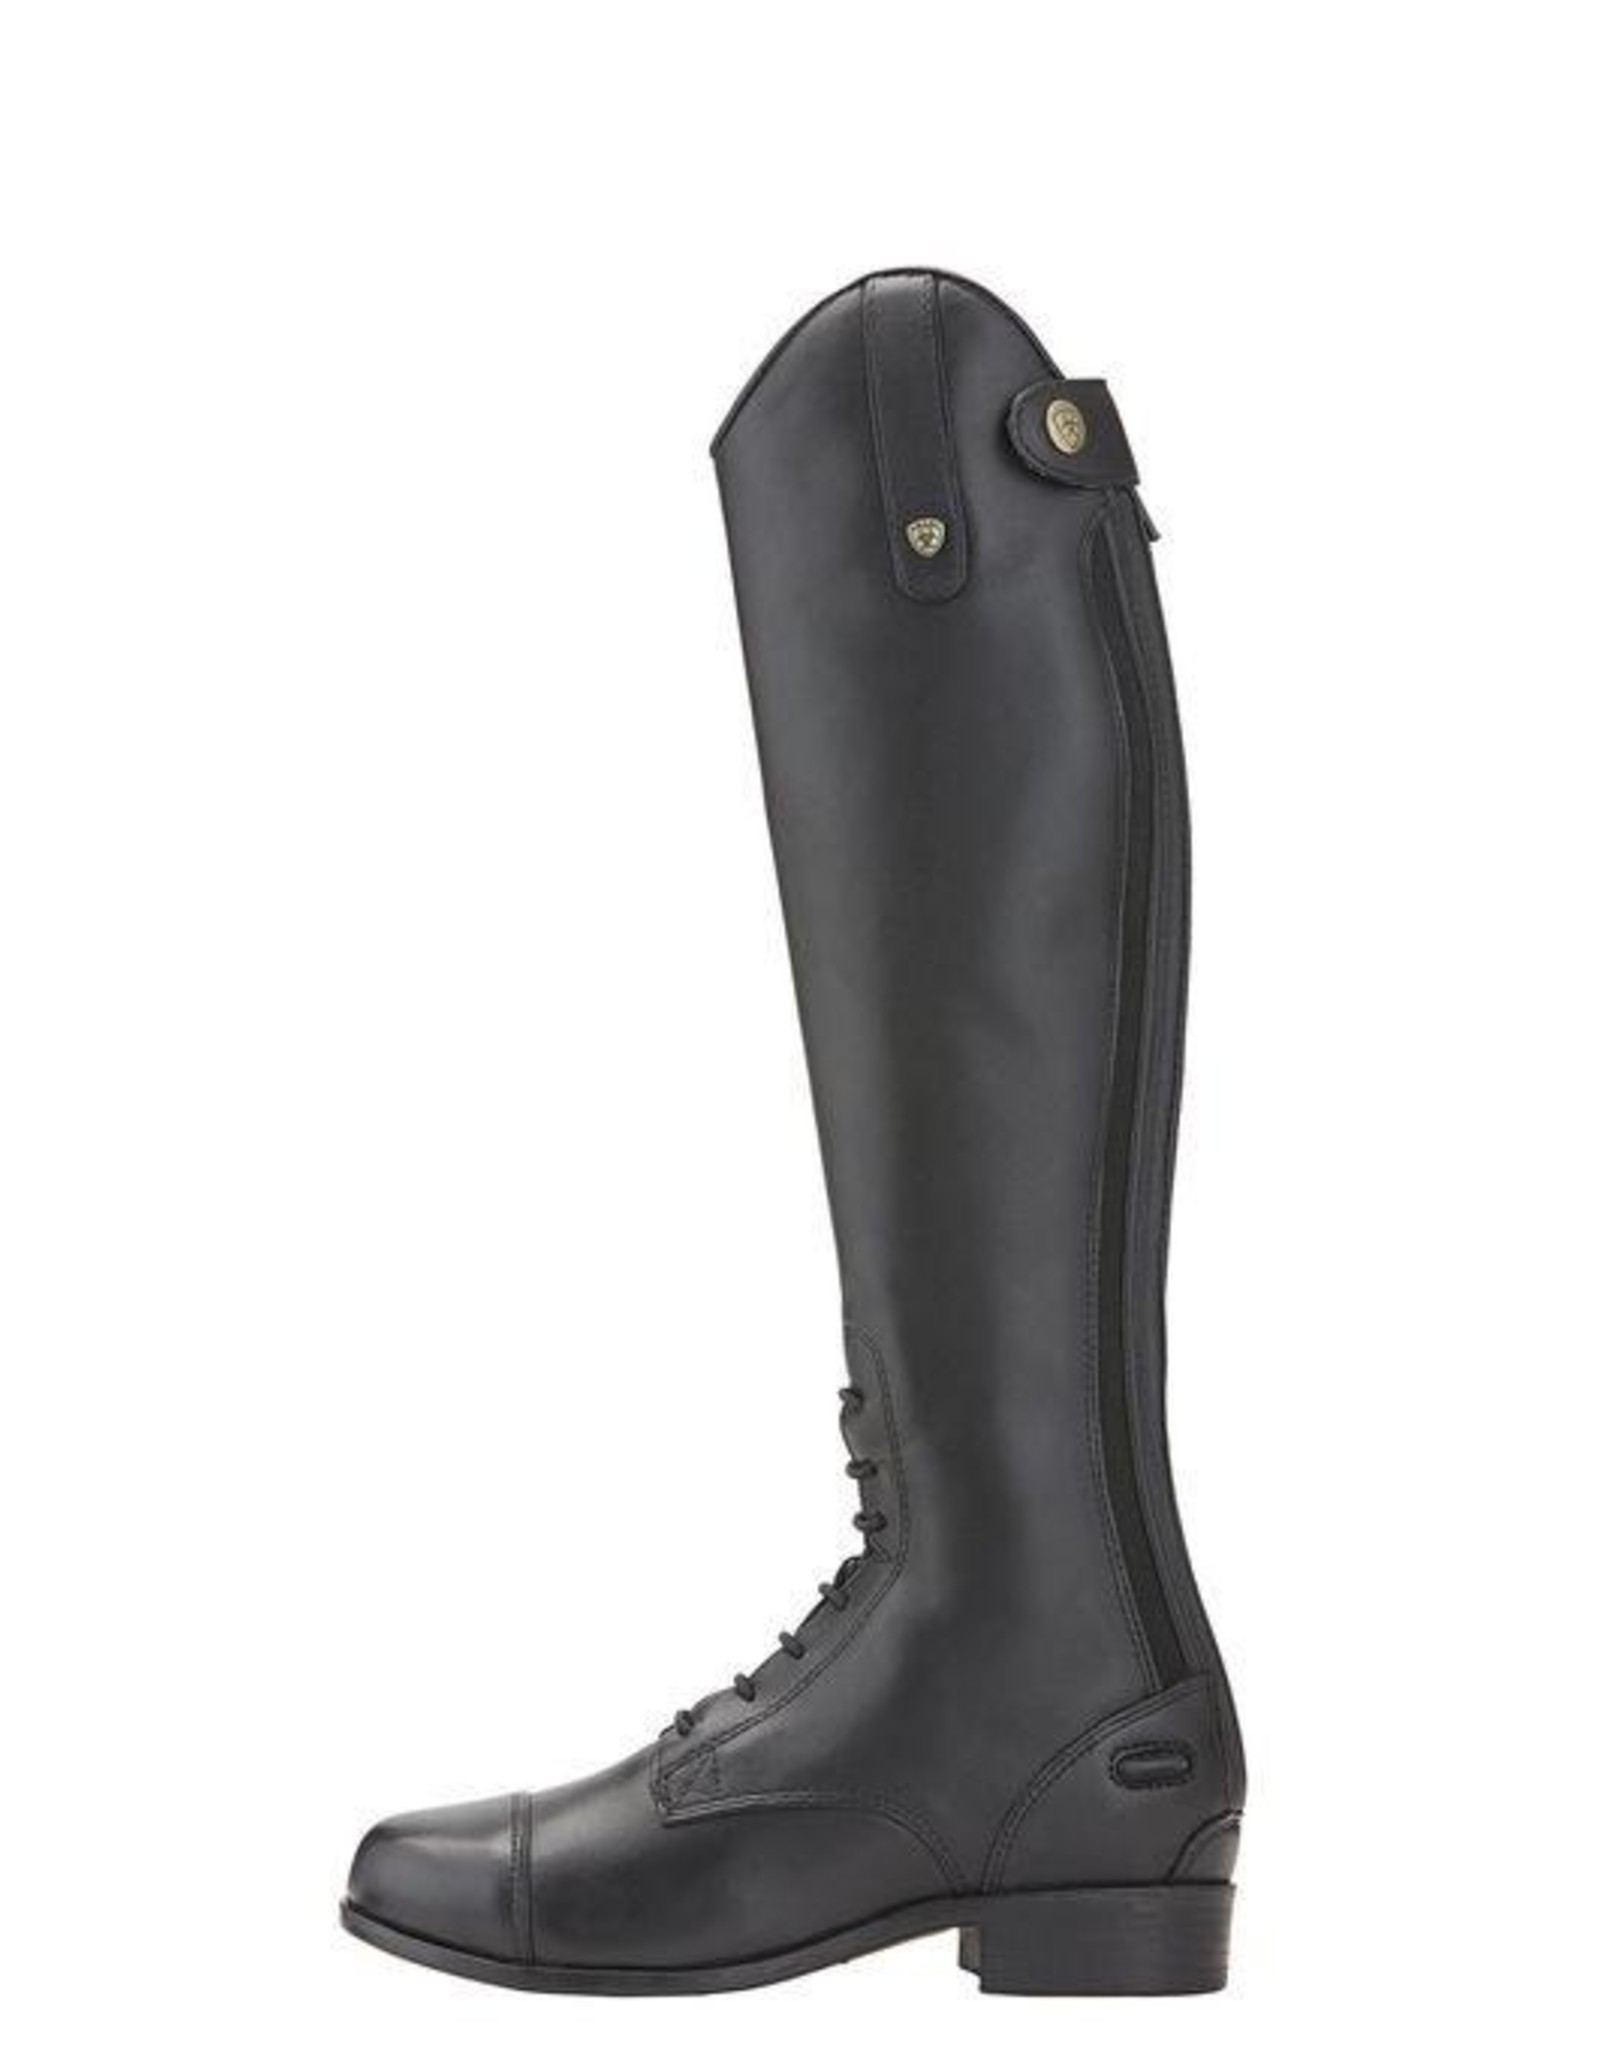 Ariat Kids' Heritage Field Zip Tall Riding Boot